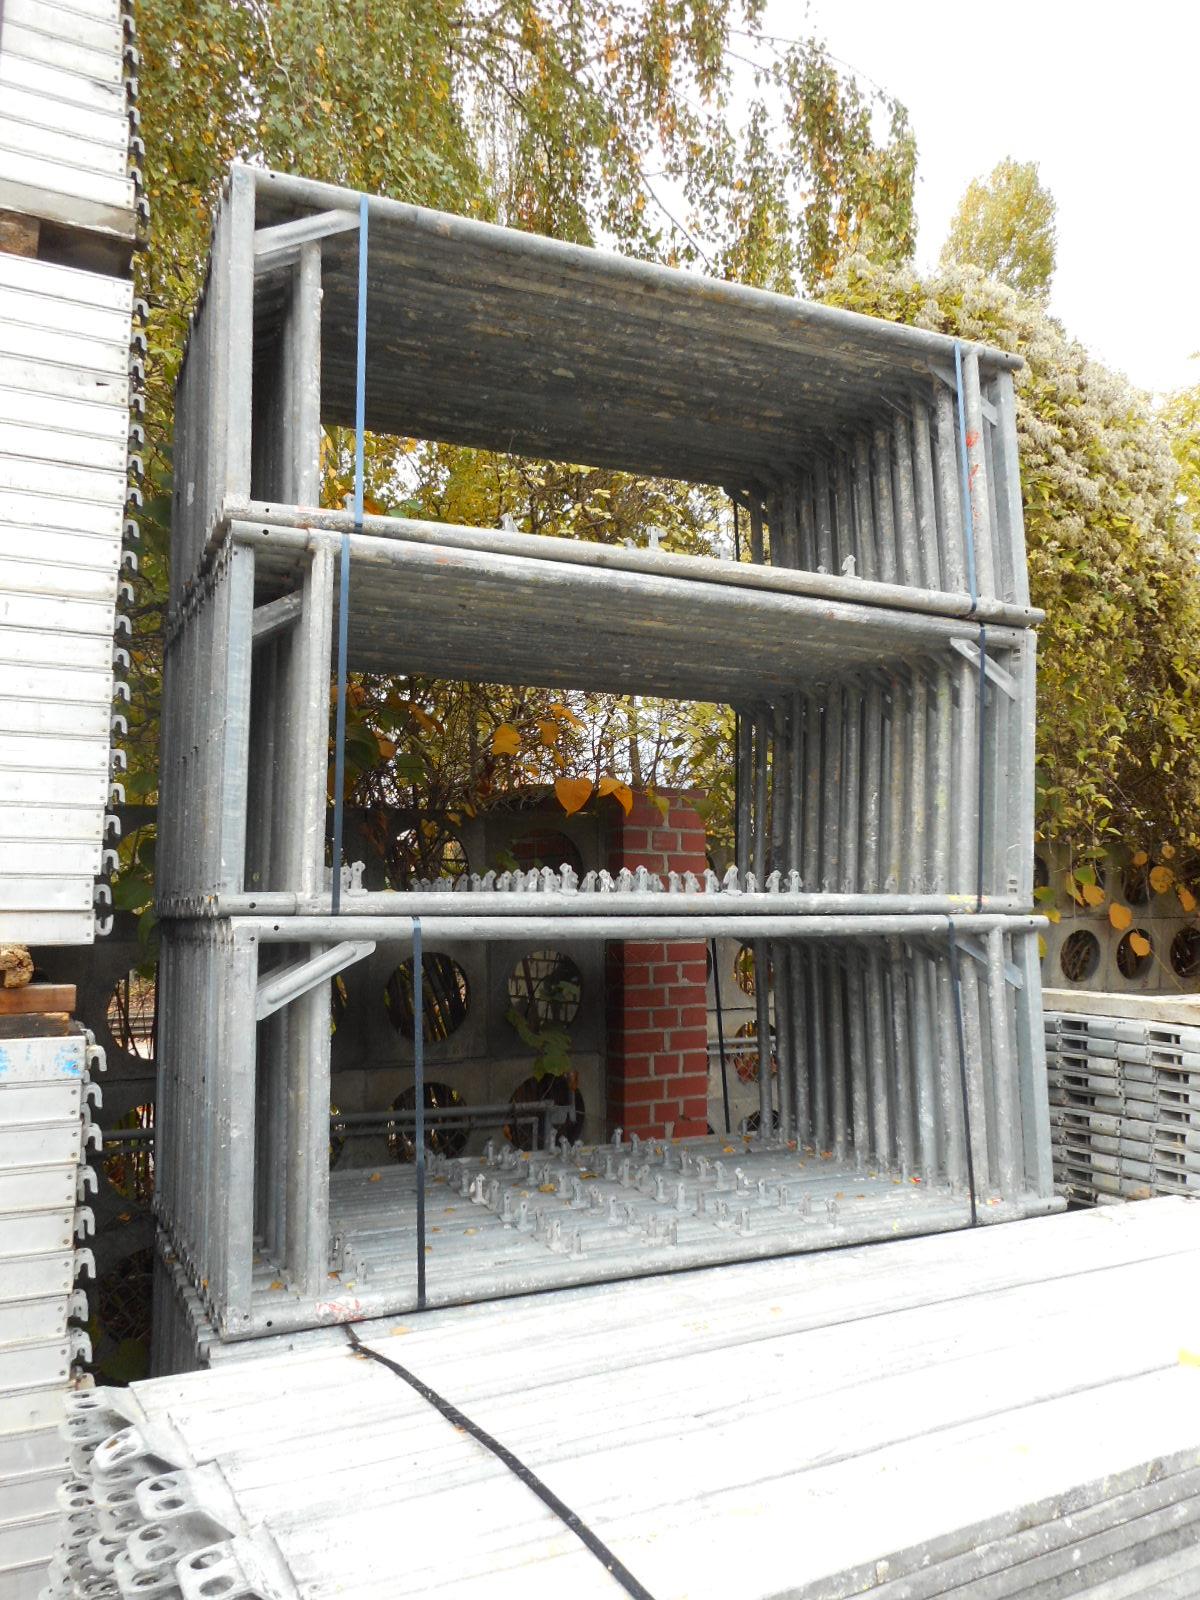 echafaudage d 39 occasion h nnebeck 800m echafaudage. Black Bedroom Furniture Sets. Home Design Ideas